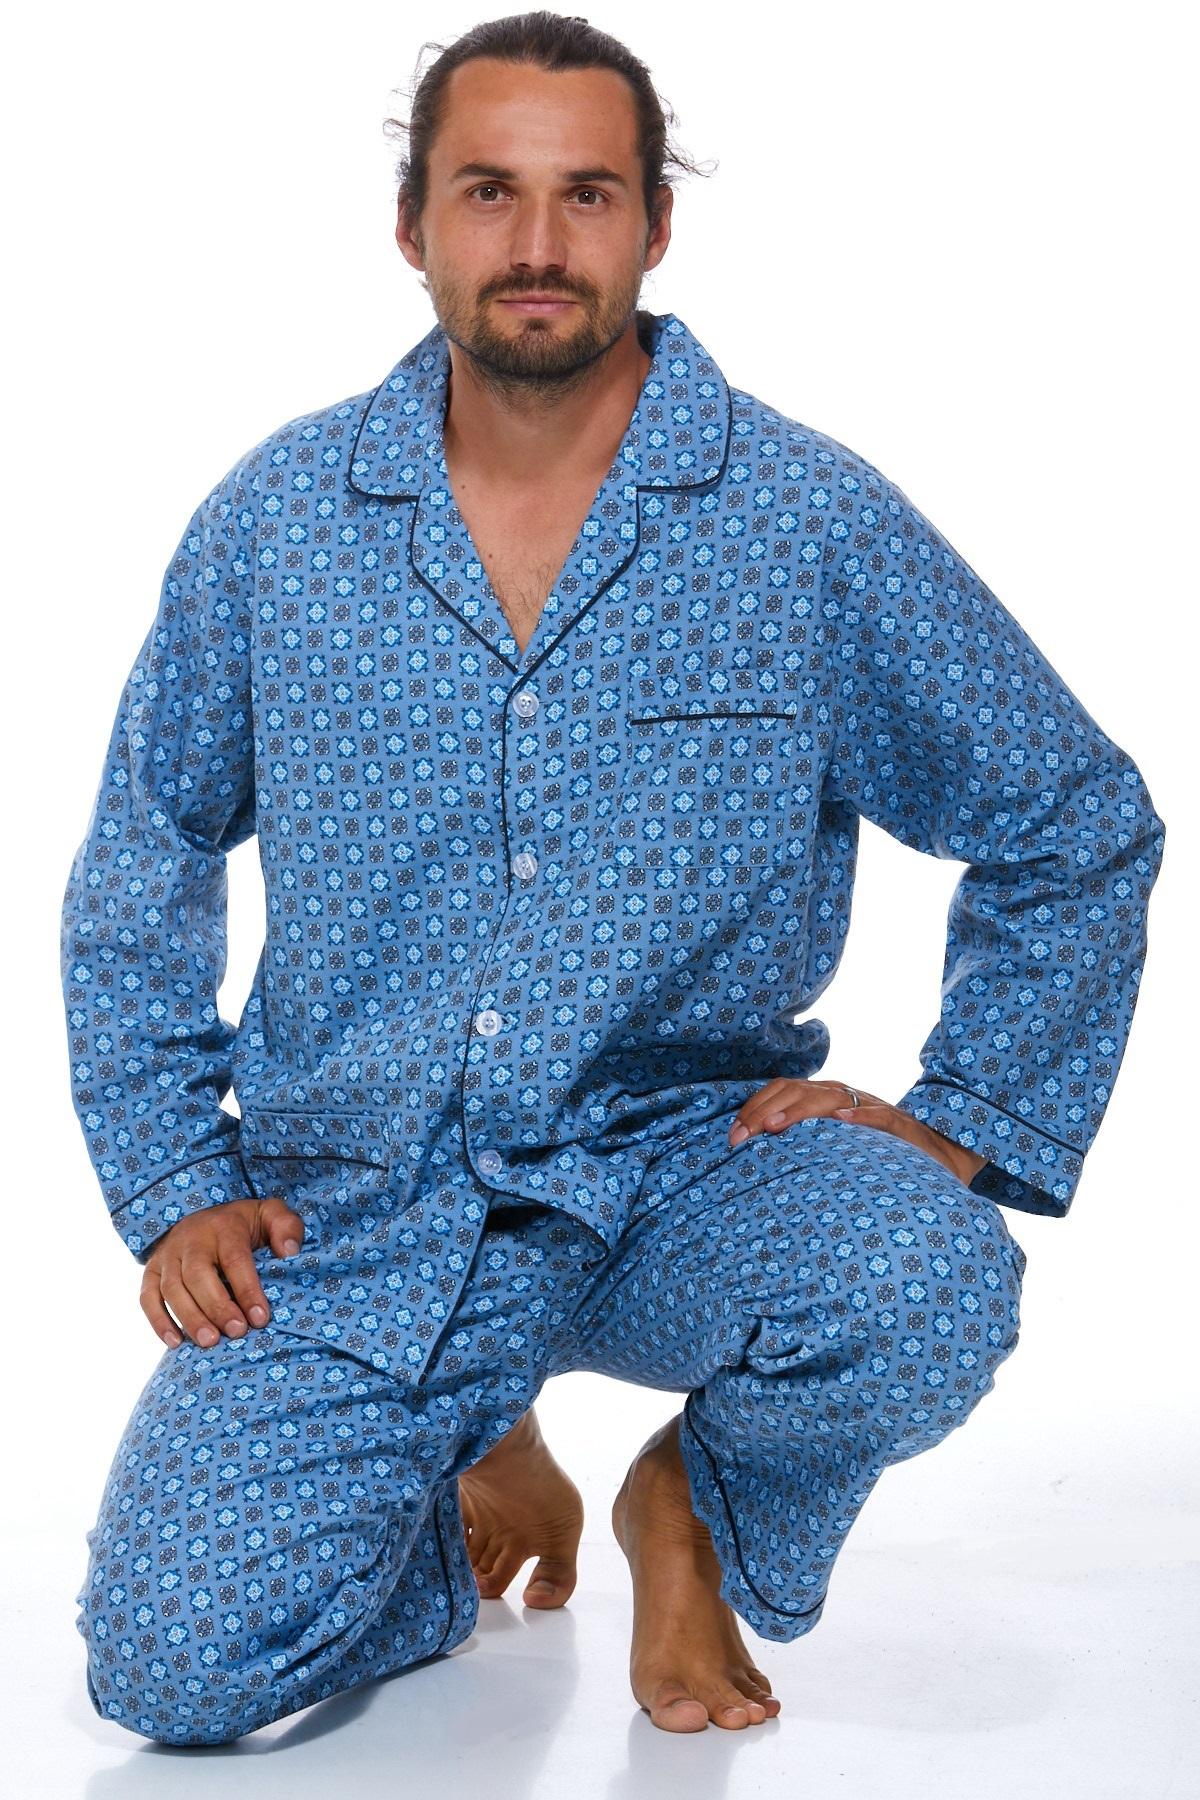 Pyžamo teplé pro muže PAPM412